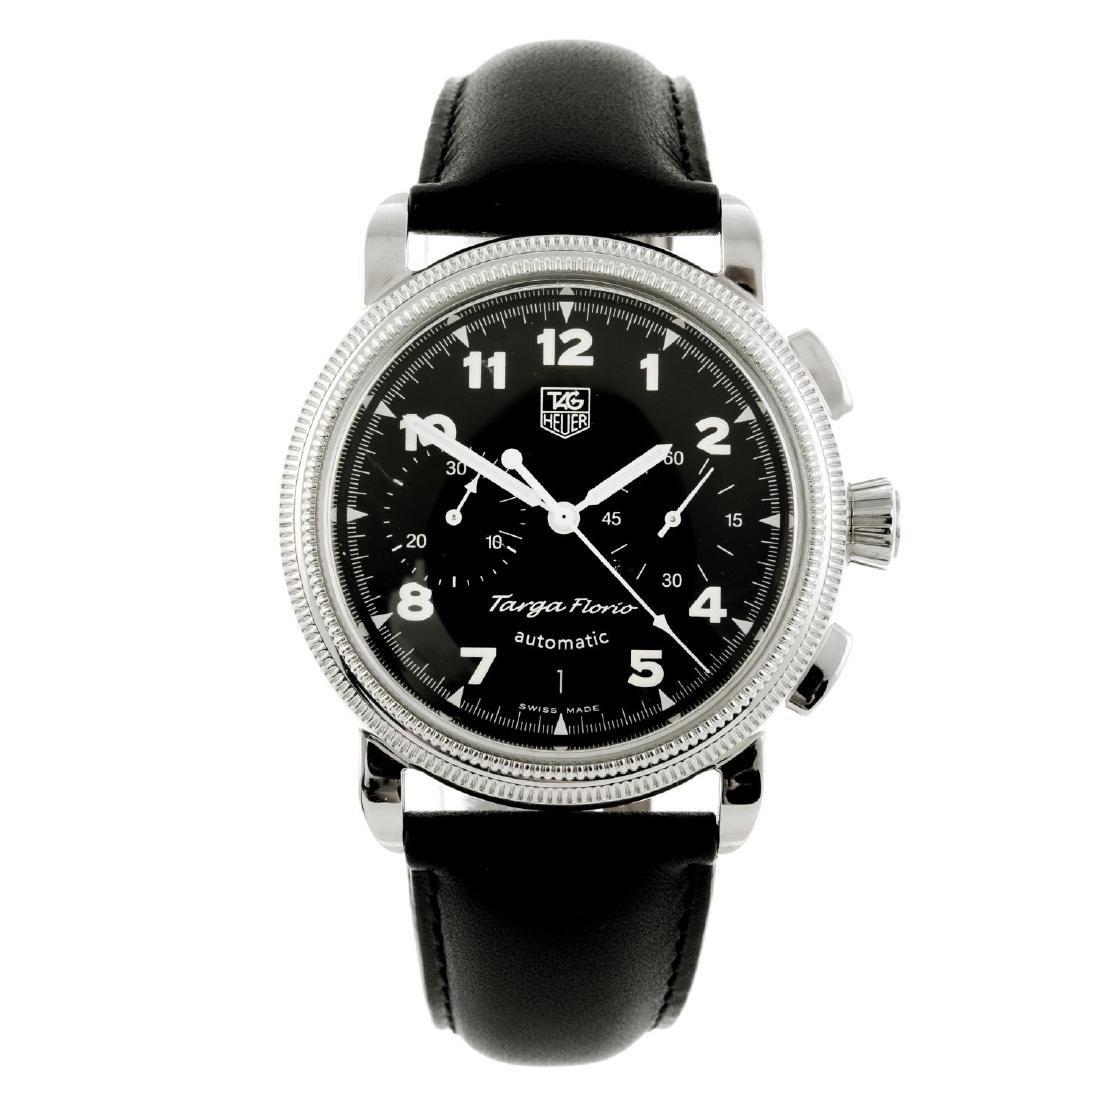 TAG HEUER - a gentleman's Targa Florio chronograph